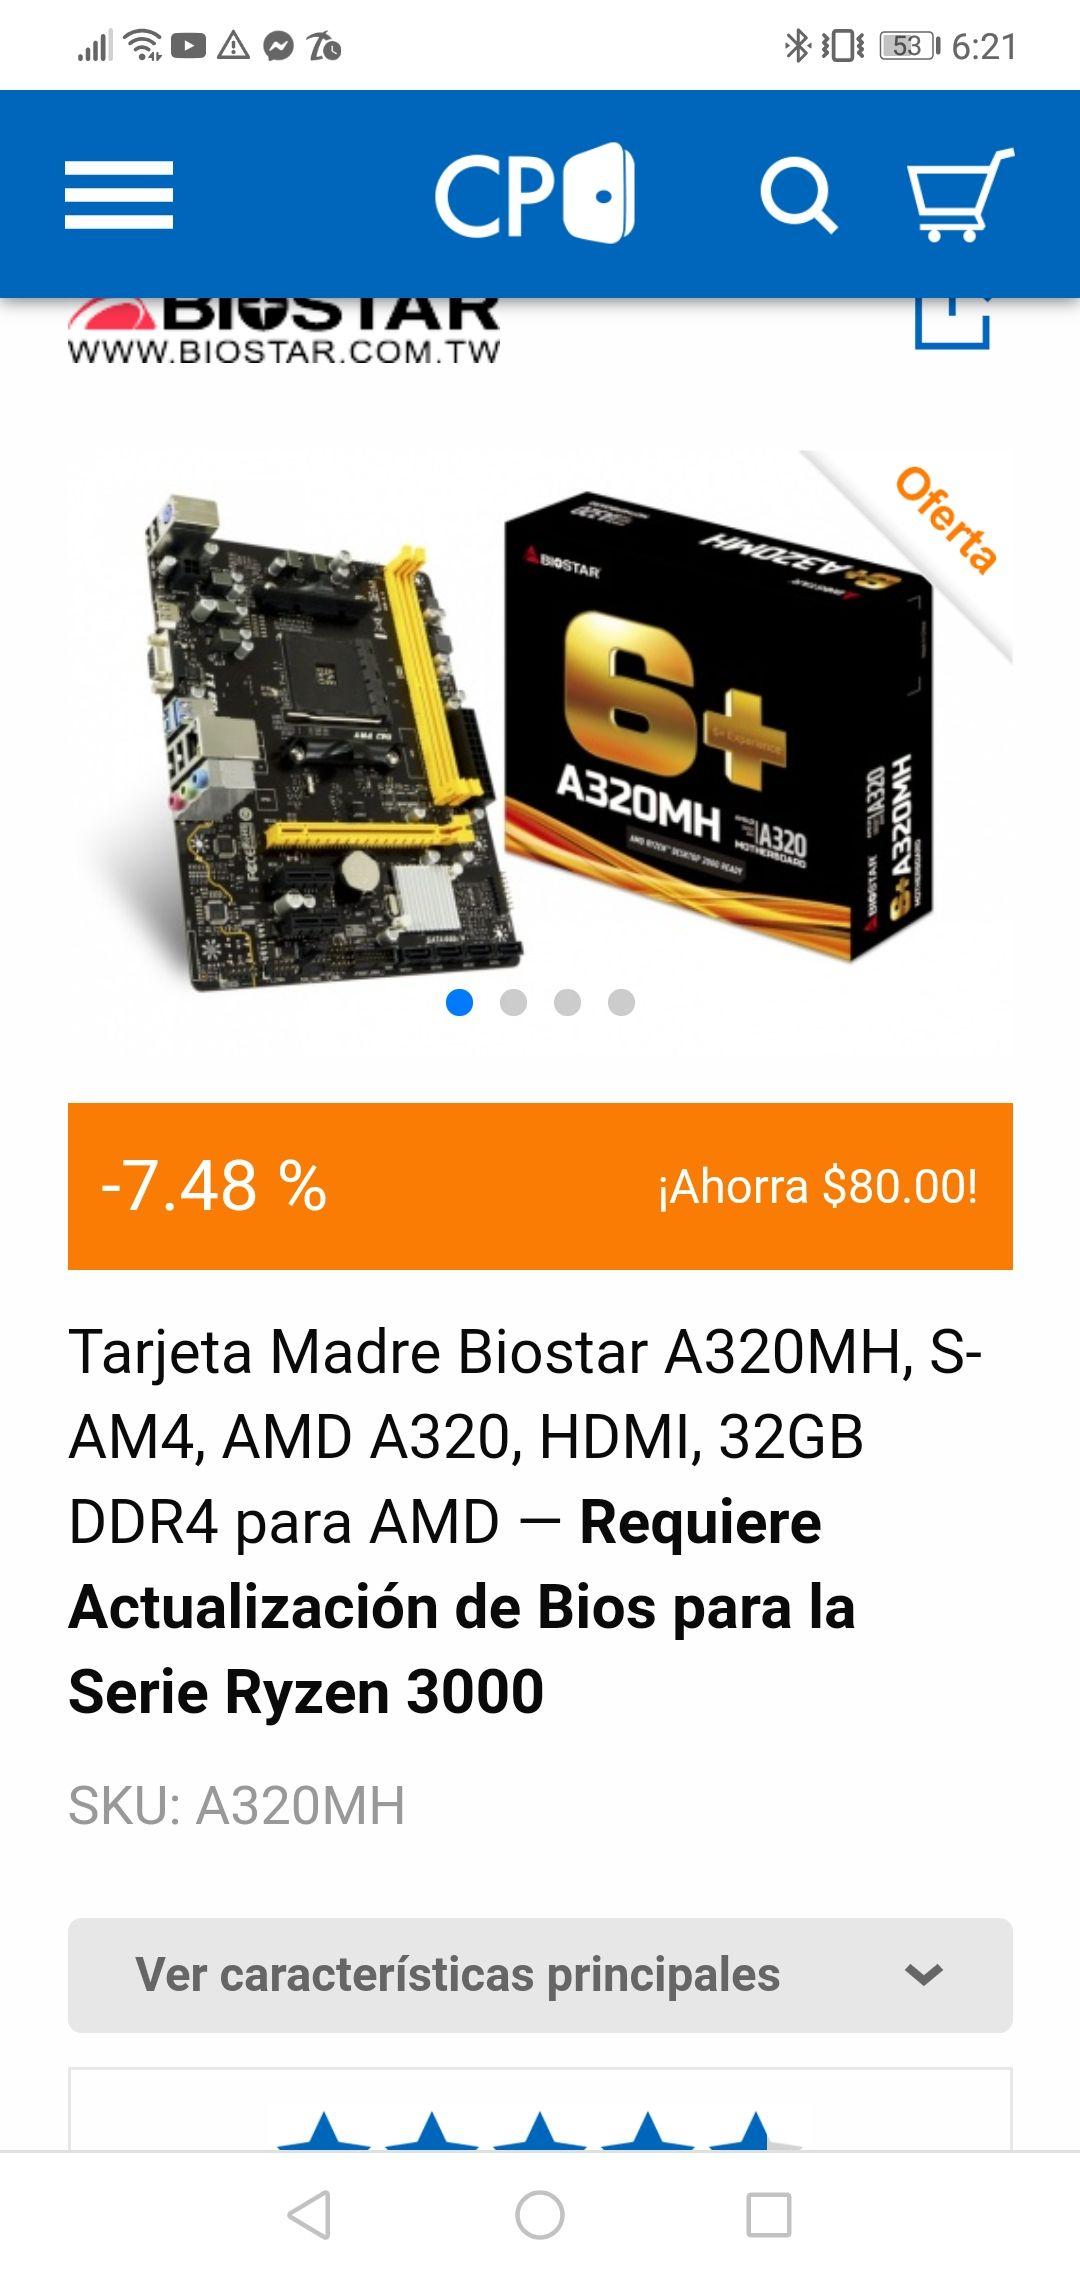 CyberPuerta: Tarjeta Madre Biostar A320MH, S-AM4, AMD A320, HDMI, 32GB DDR4 para AMD